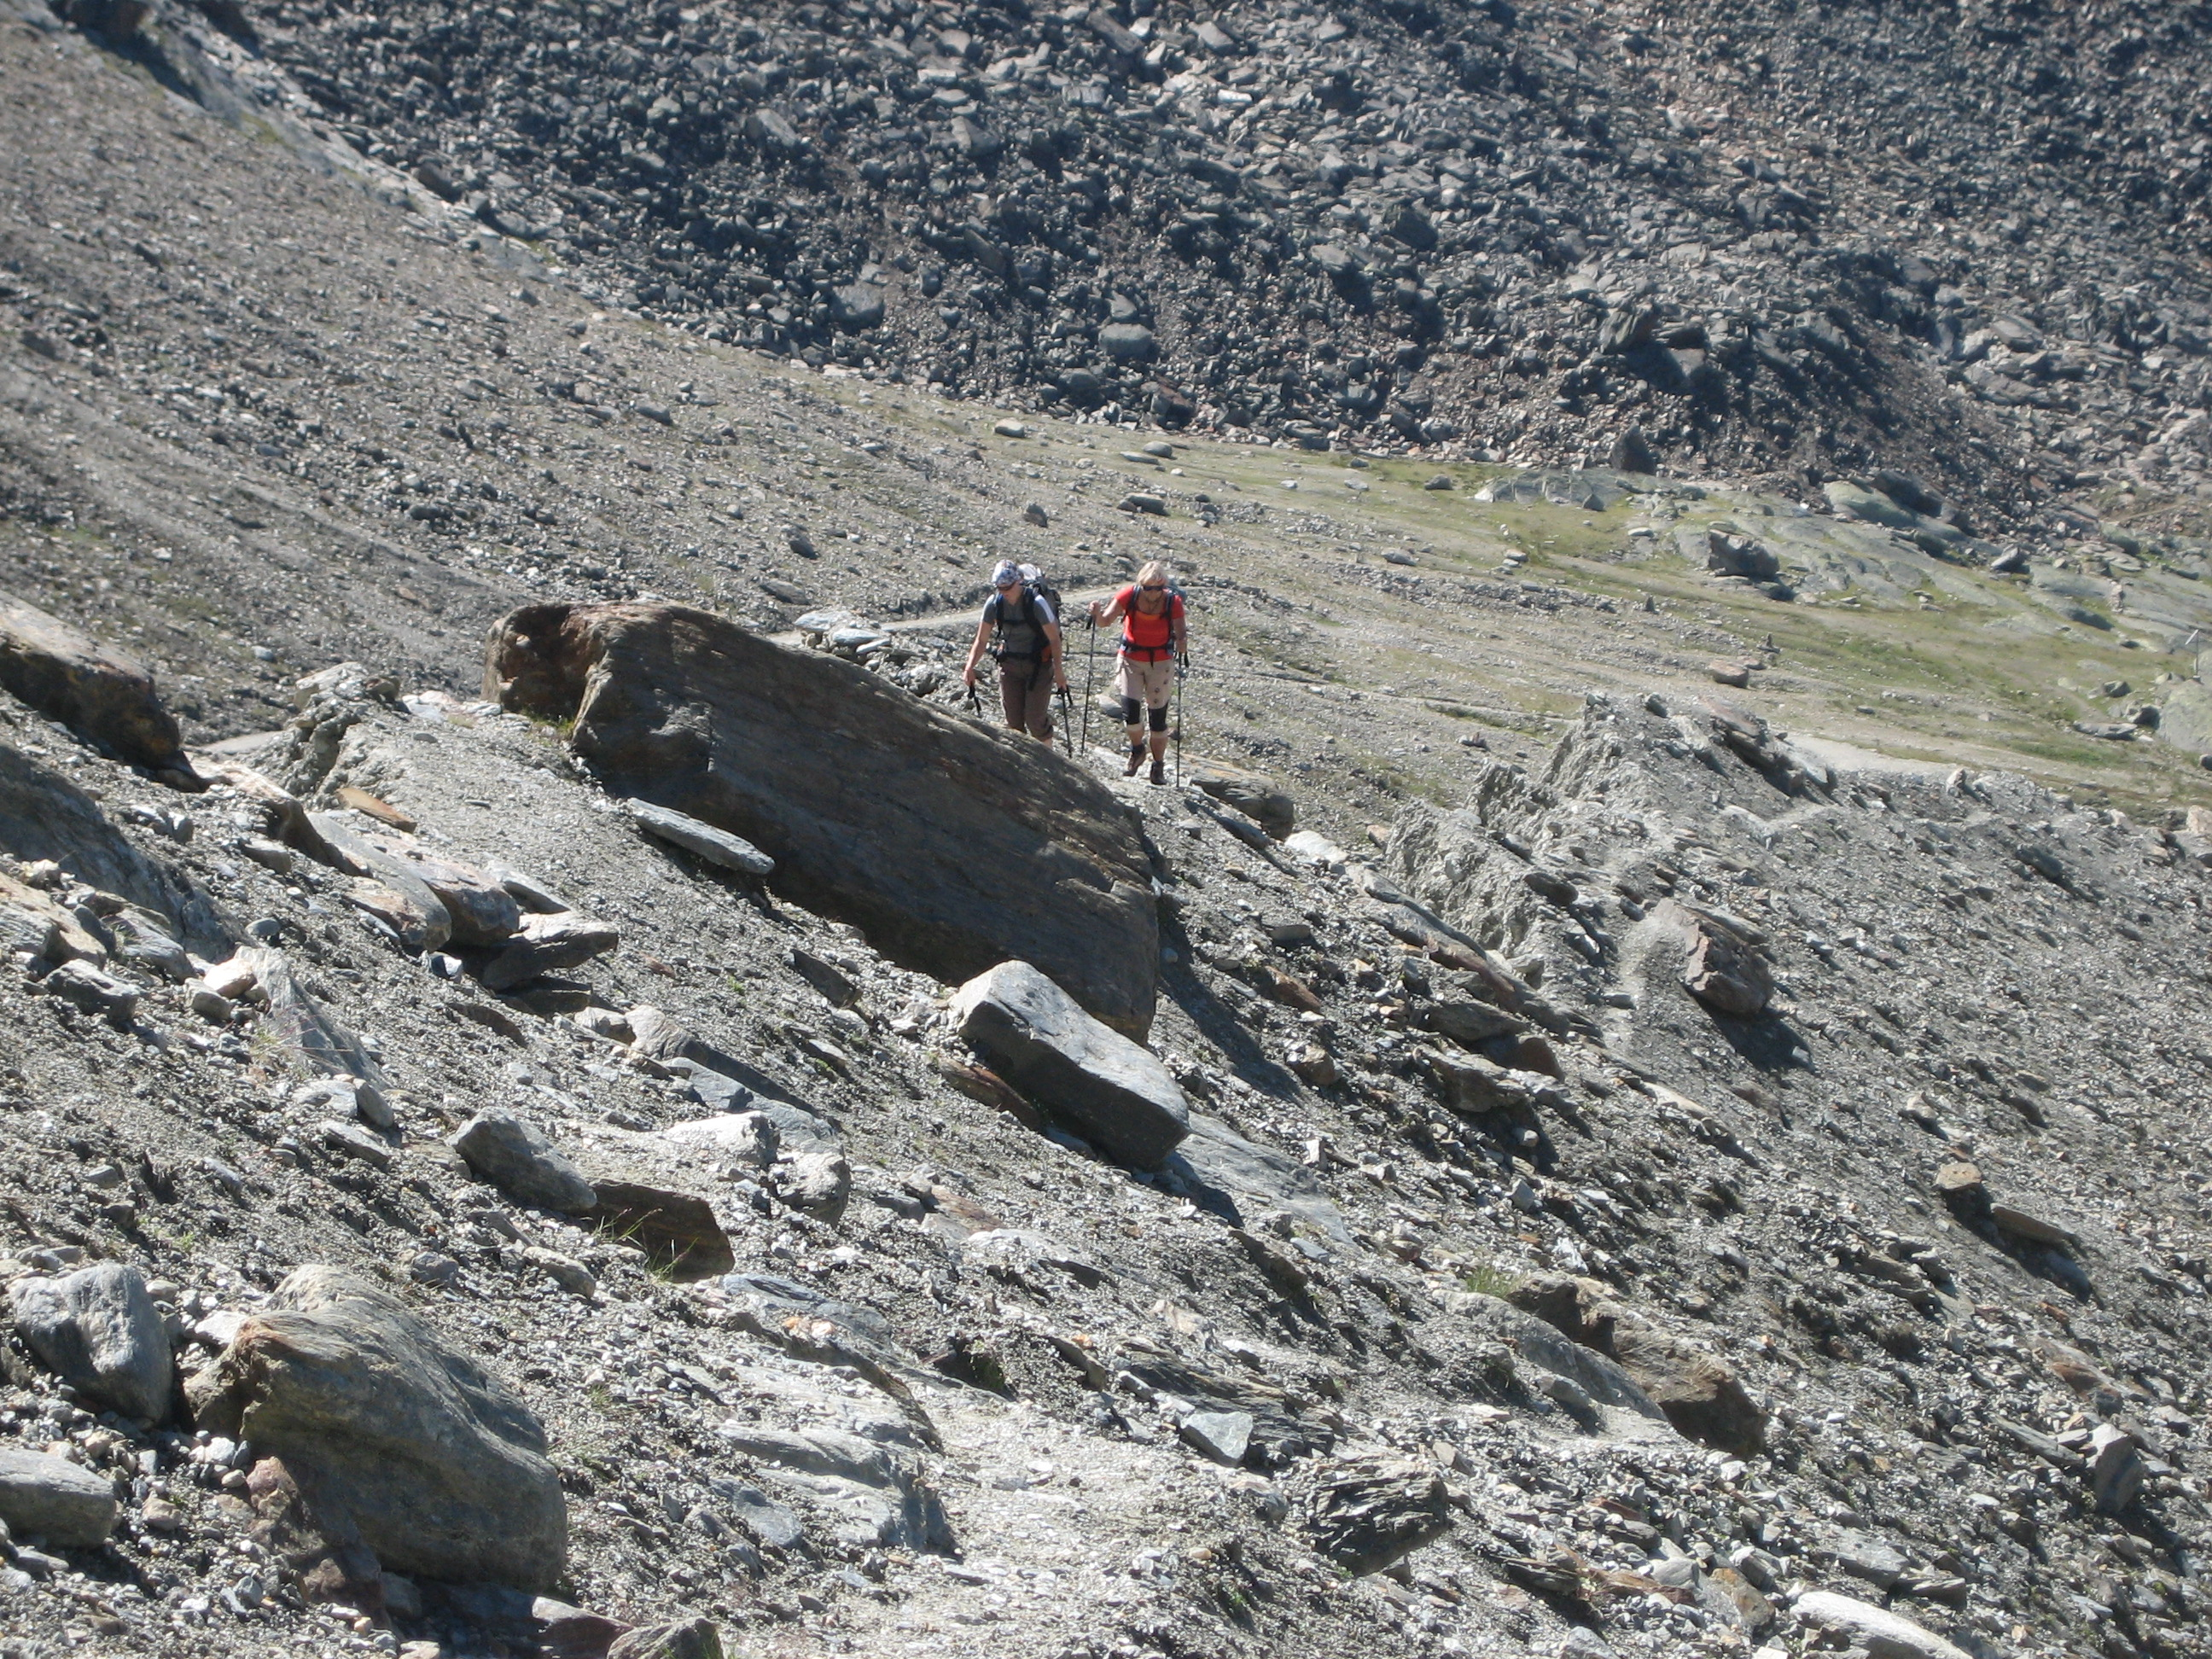 Klettersteig Jegihorn : Jegihorn klettersteig faszination hochtouren